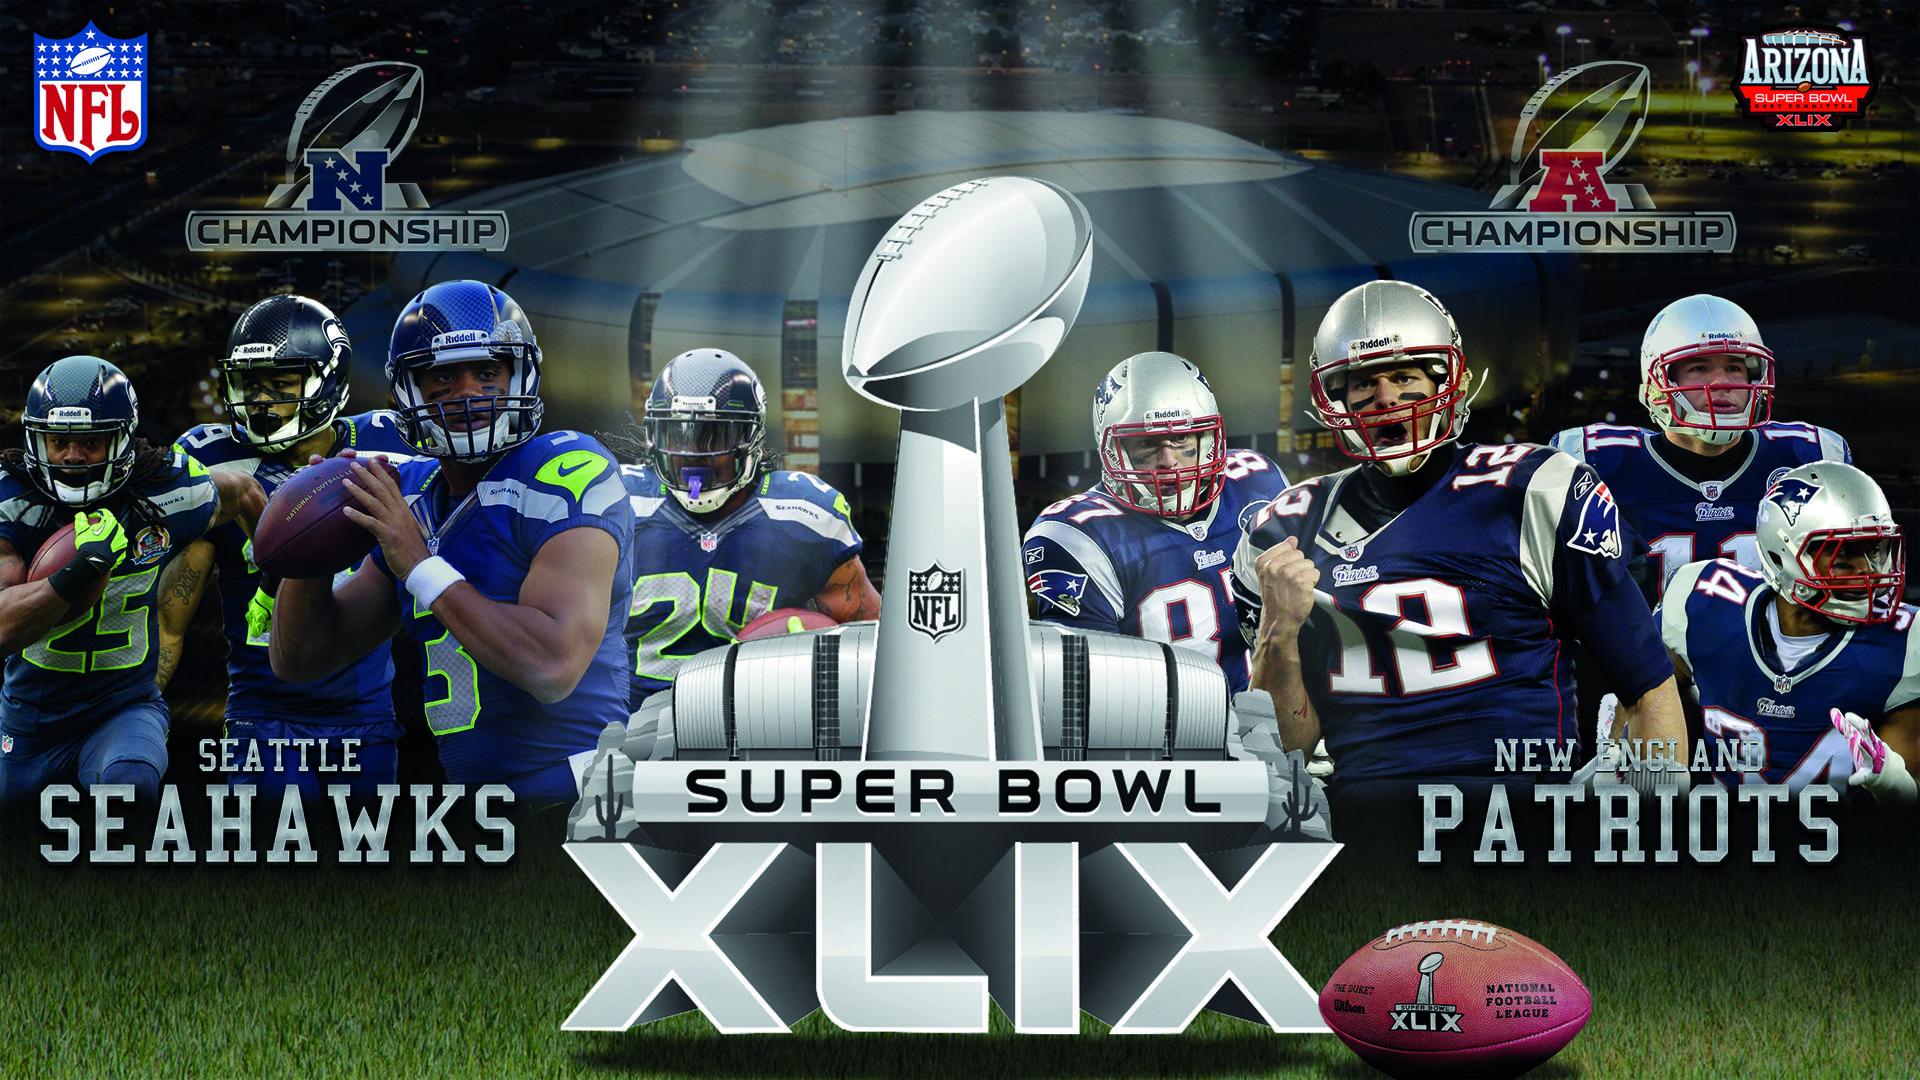 Free Super Bowl Wallpapers WallpaperSafari | Wallpaper Picture Photo